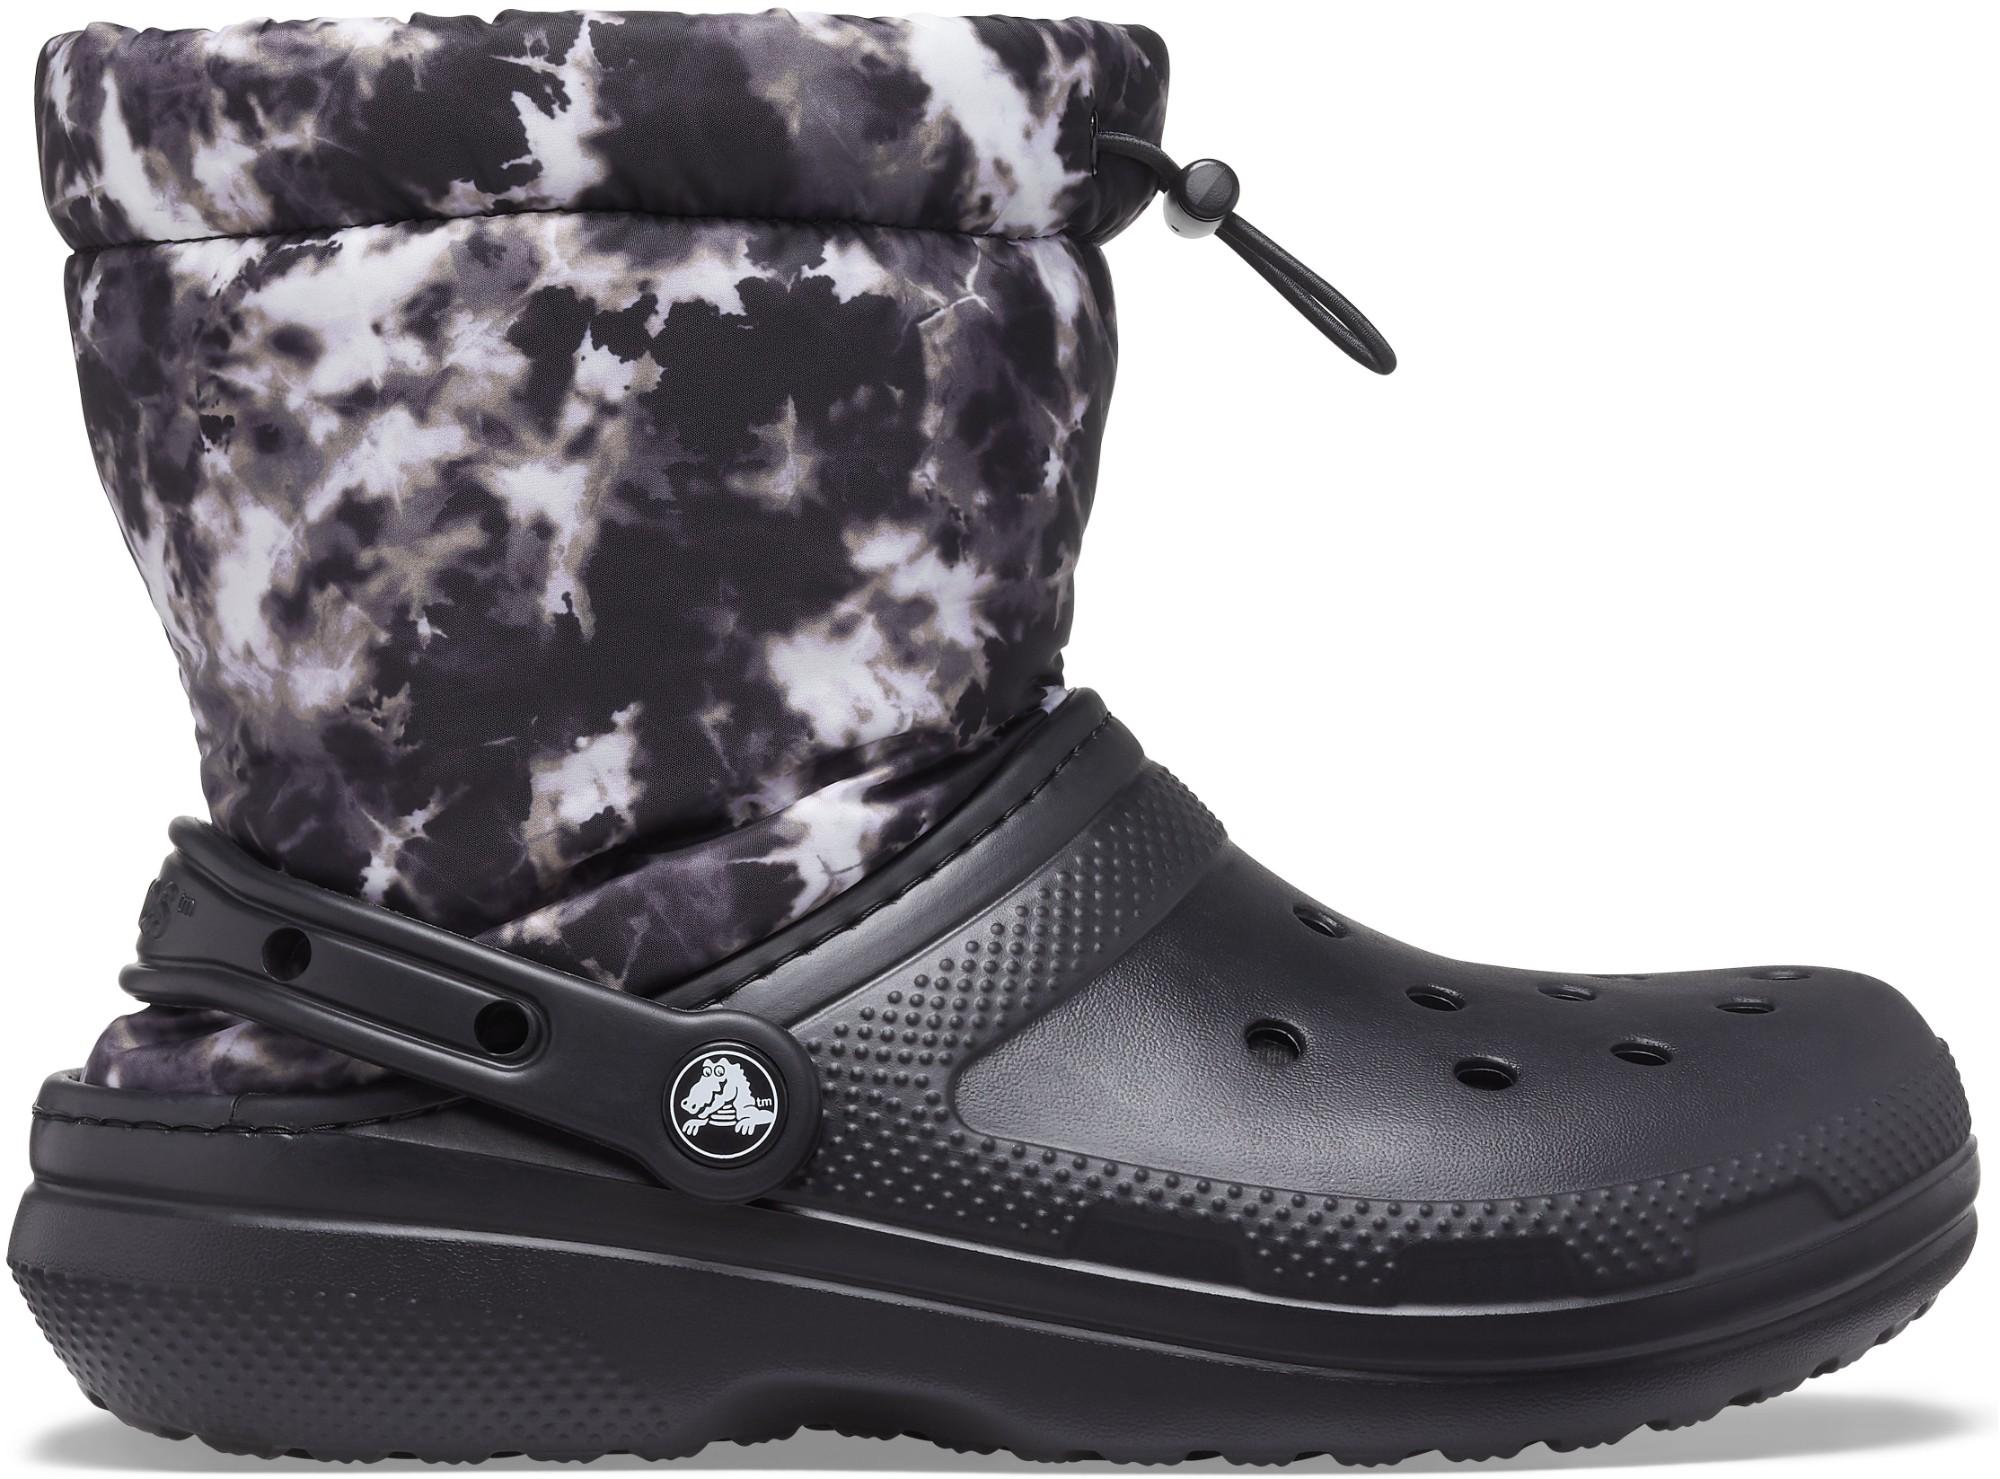 Crocs™ Classic Lined Neo Puff Tie Dye Boot Black 38,5